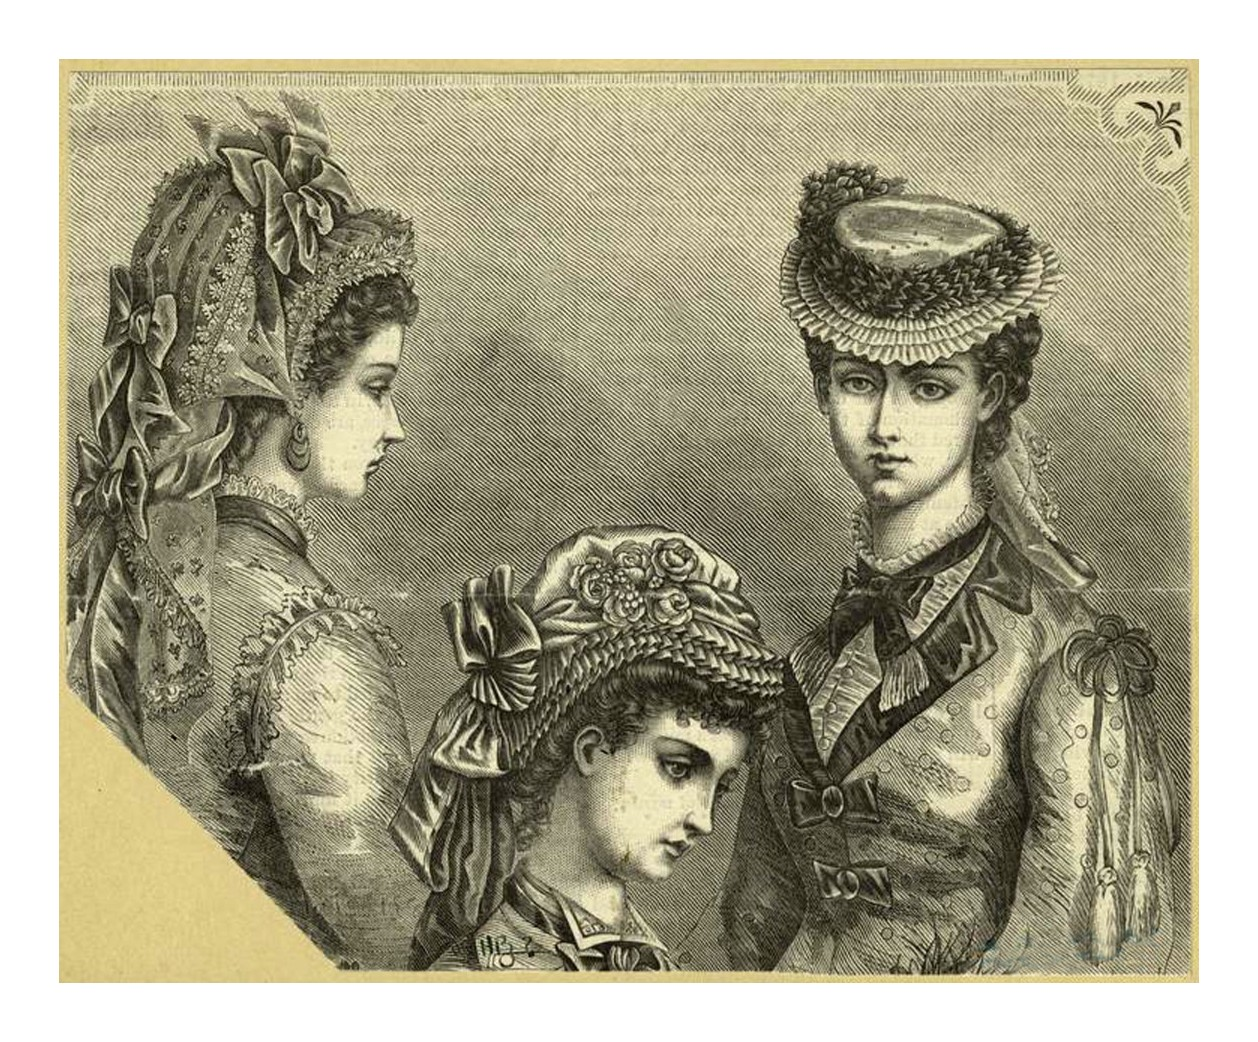 prostitutas siglo xix sinónimos de mujer